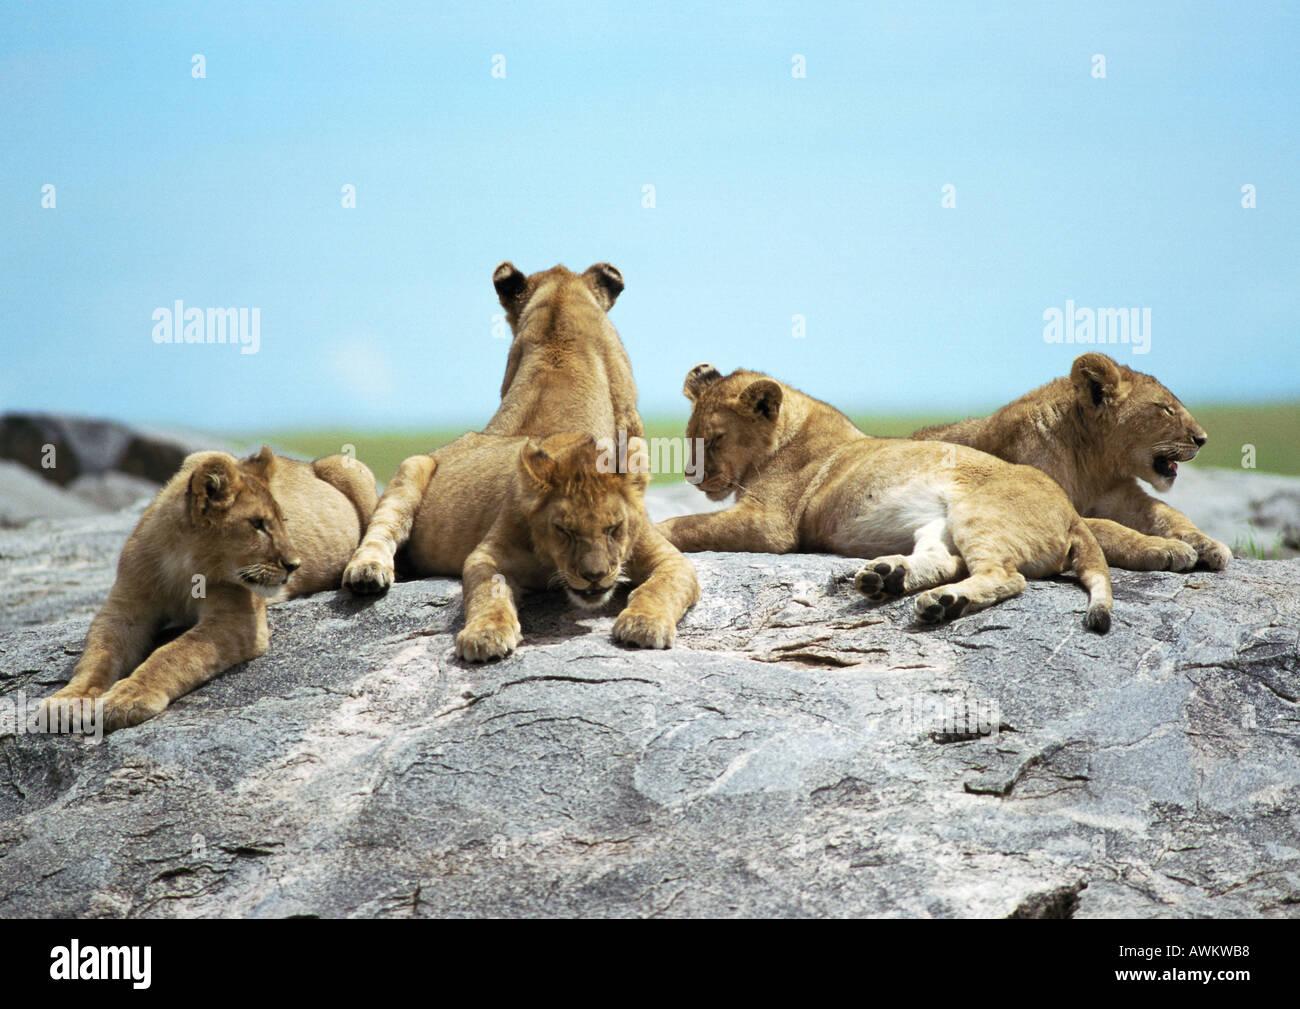 Cachorros de León (Panthera leo) mentir sobre roca Imagen De Stock